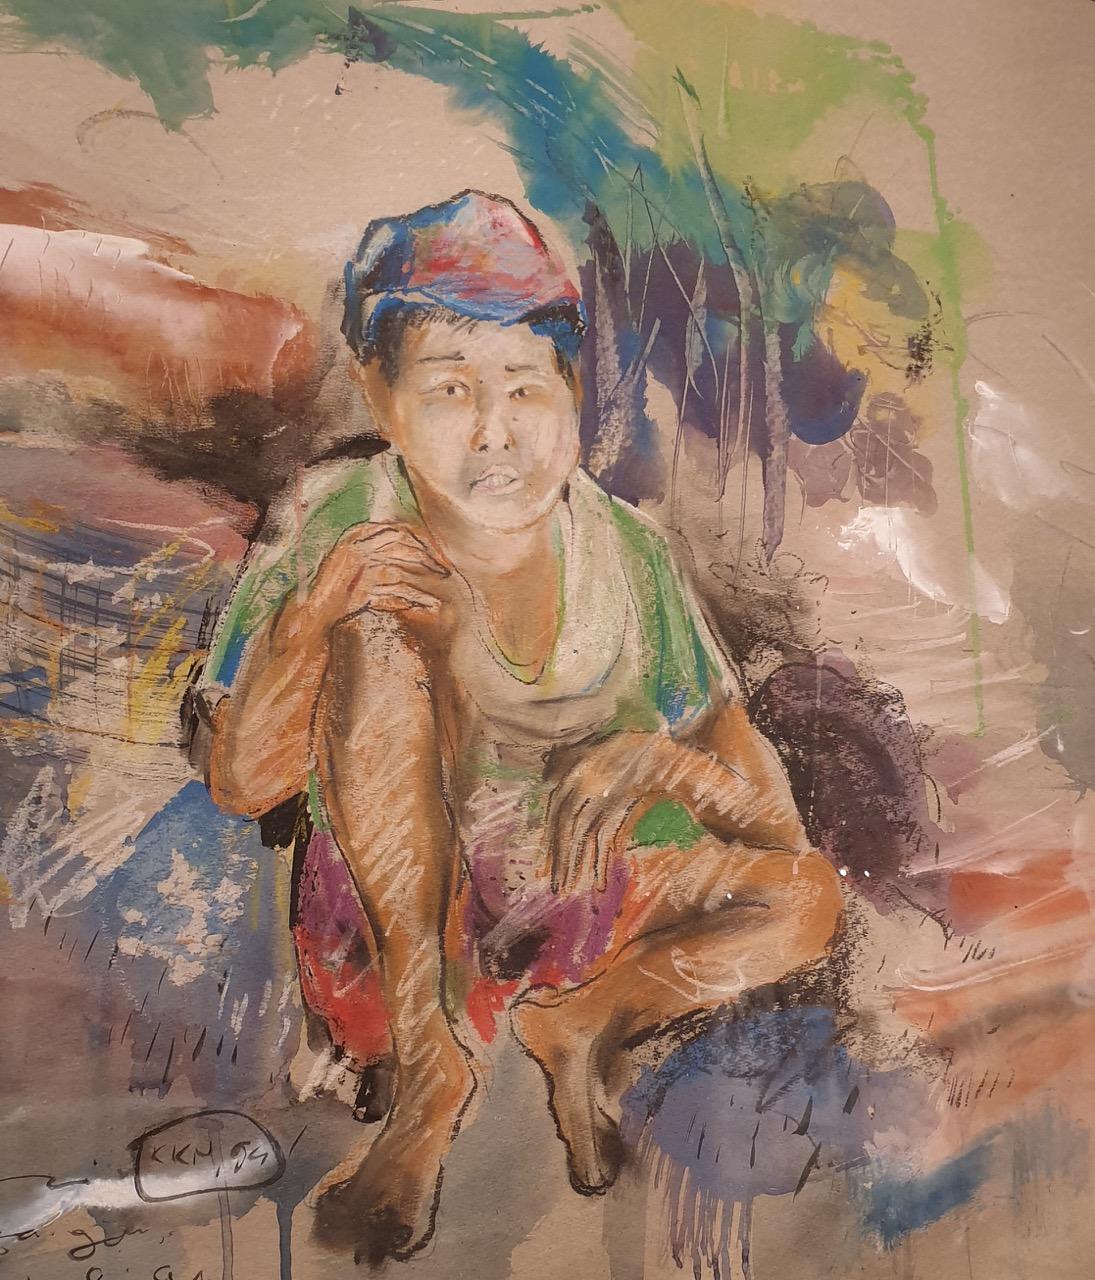 Detail of watercolour composition on paper by Nyoman Sukari , circa 2008 - 2009 - Image Richard Horstman